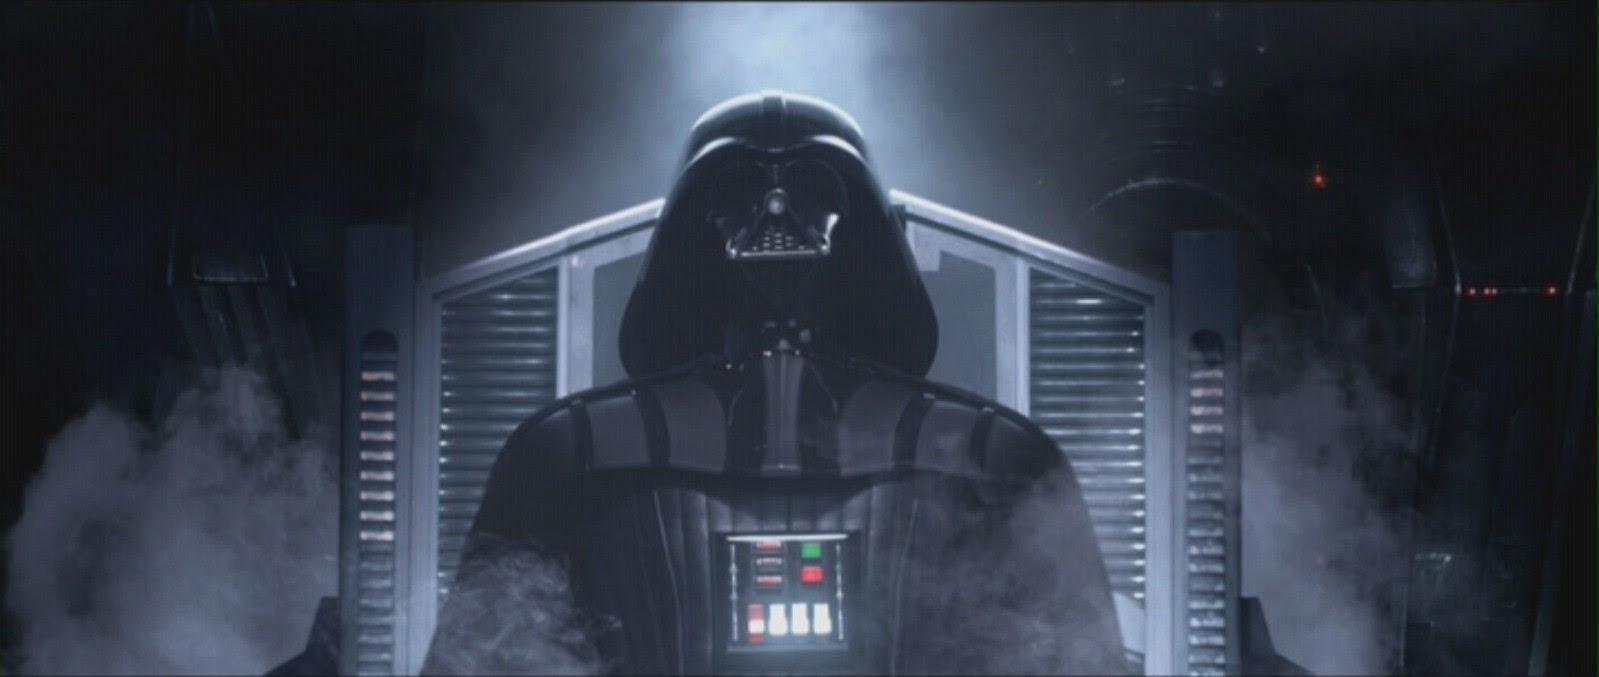 Resultado de imagem para star wars episode 3 darth vader